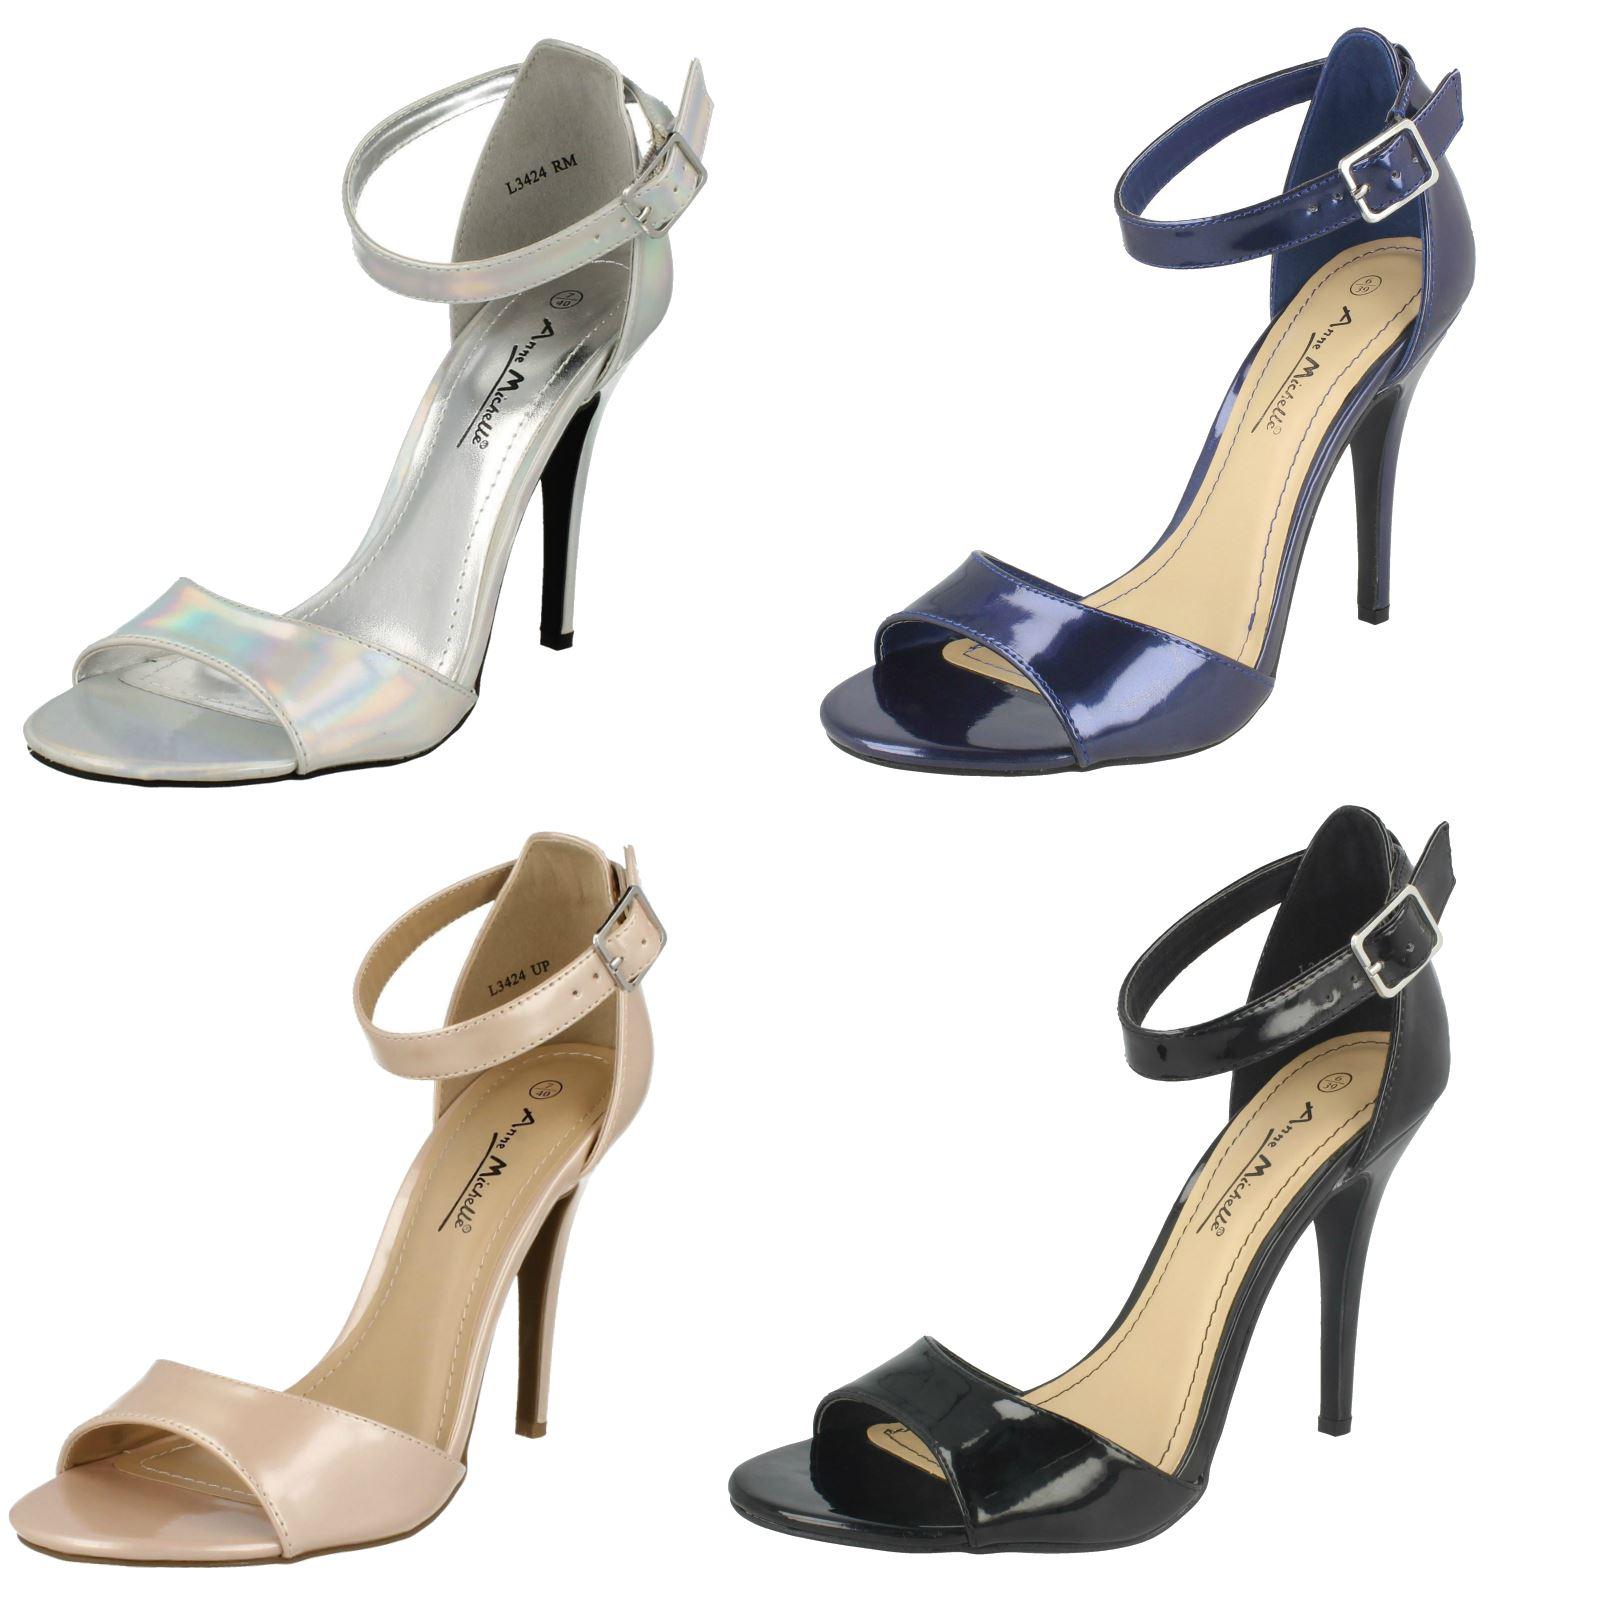 Anne Michelle WomensLadies Stiletto High Heel Peep Toe Lace